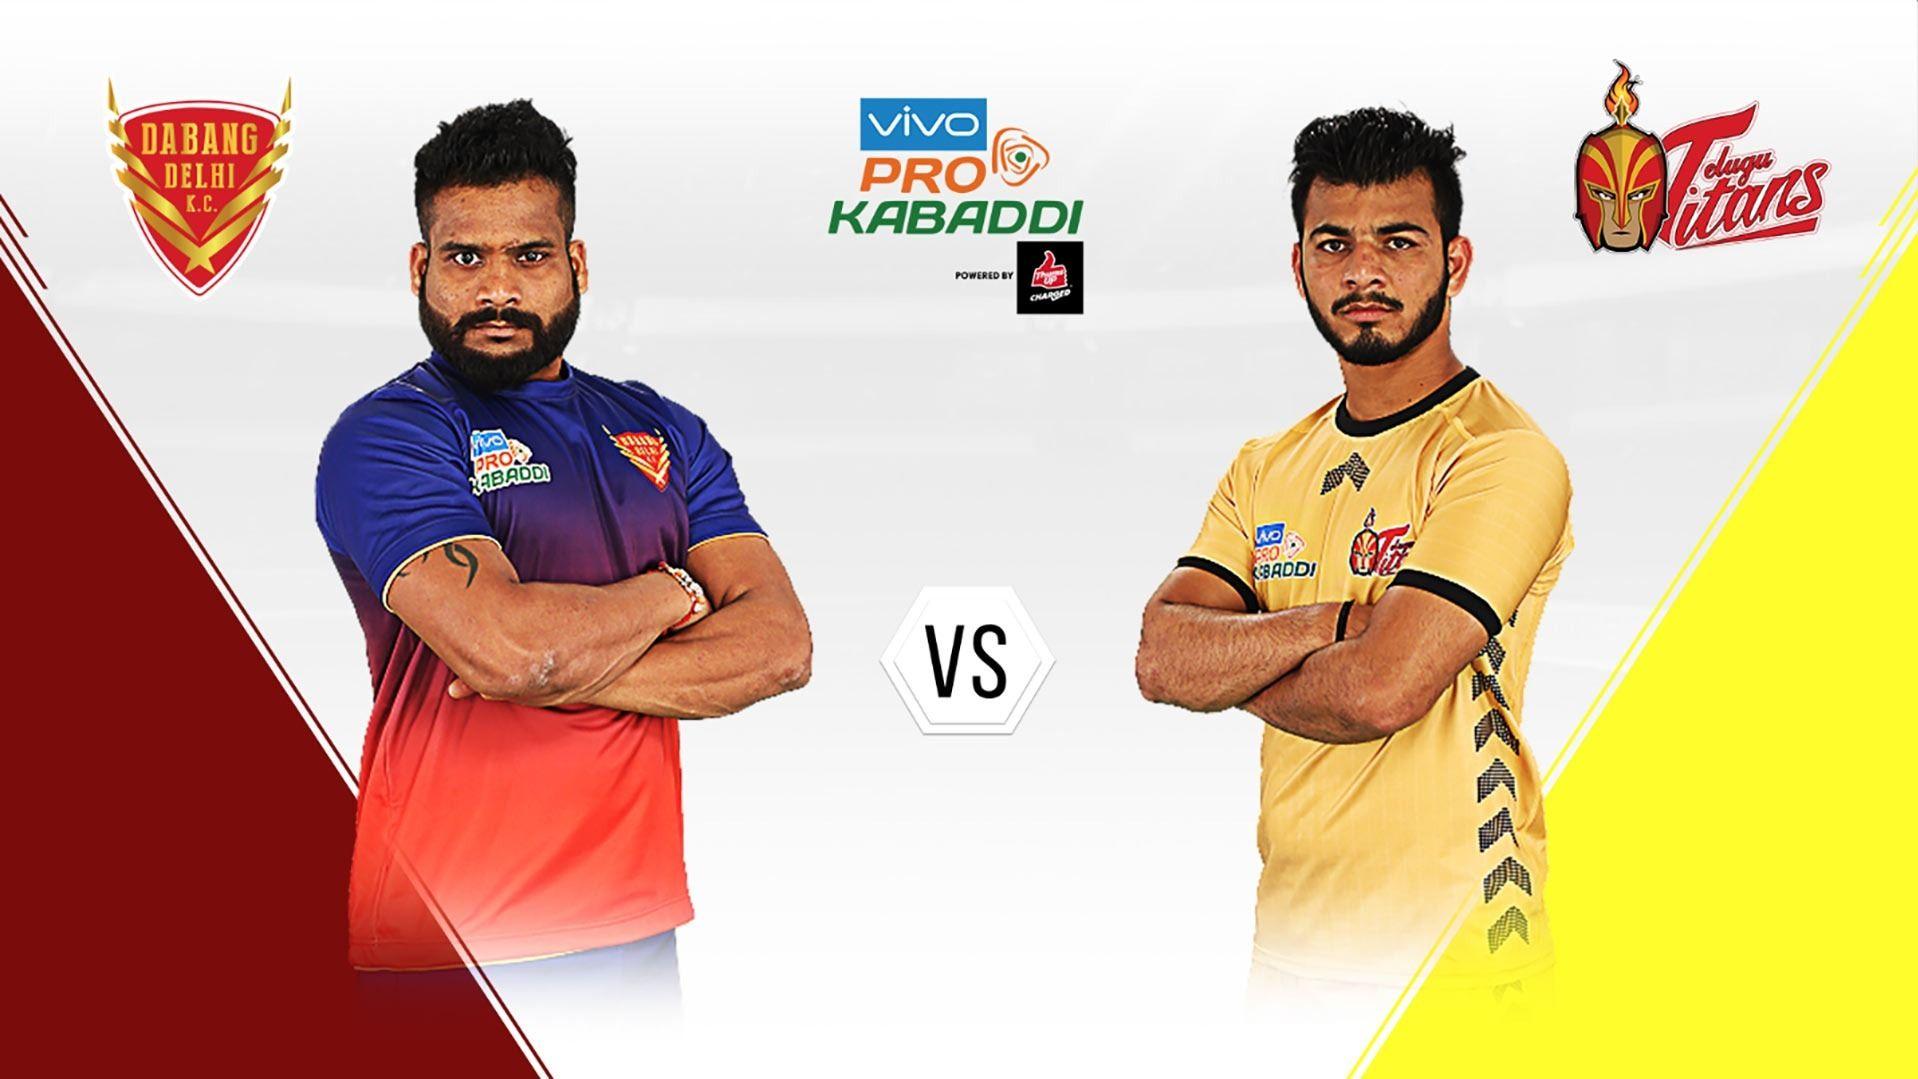 LIVE Telugu Titans vs Dabanag Delhi KC, Pro Kabaddi League 2019, live score, HYD vs DEL Live Score and Updates, Point by point update, HYD vs DEL, HYD vs DEL Live streaming, HYD vs DEL Live Scorecard, PKL 2019, Pro Kabaddi League 2019 1 Match 8, live HYD vs DEL, live score HYD vs DEL, live scorecard, HYD vs DEL Live, Live Score HYD vs DEL Match 8, Match 8 HYD vs DEL Live Updates